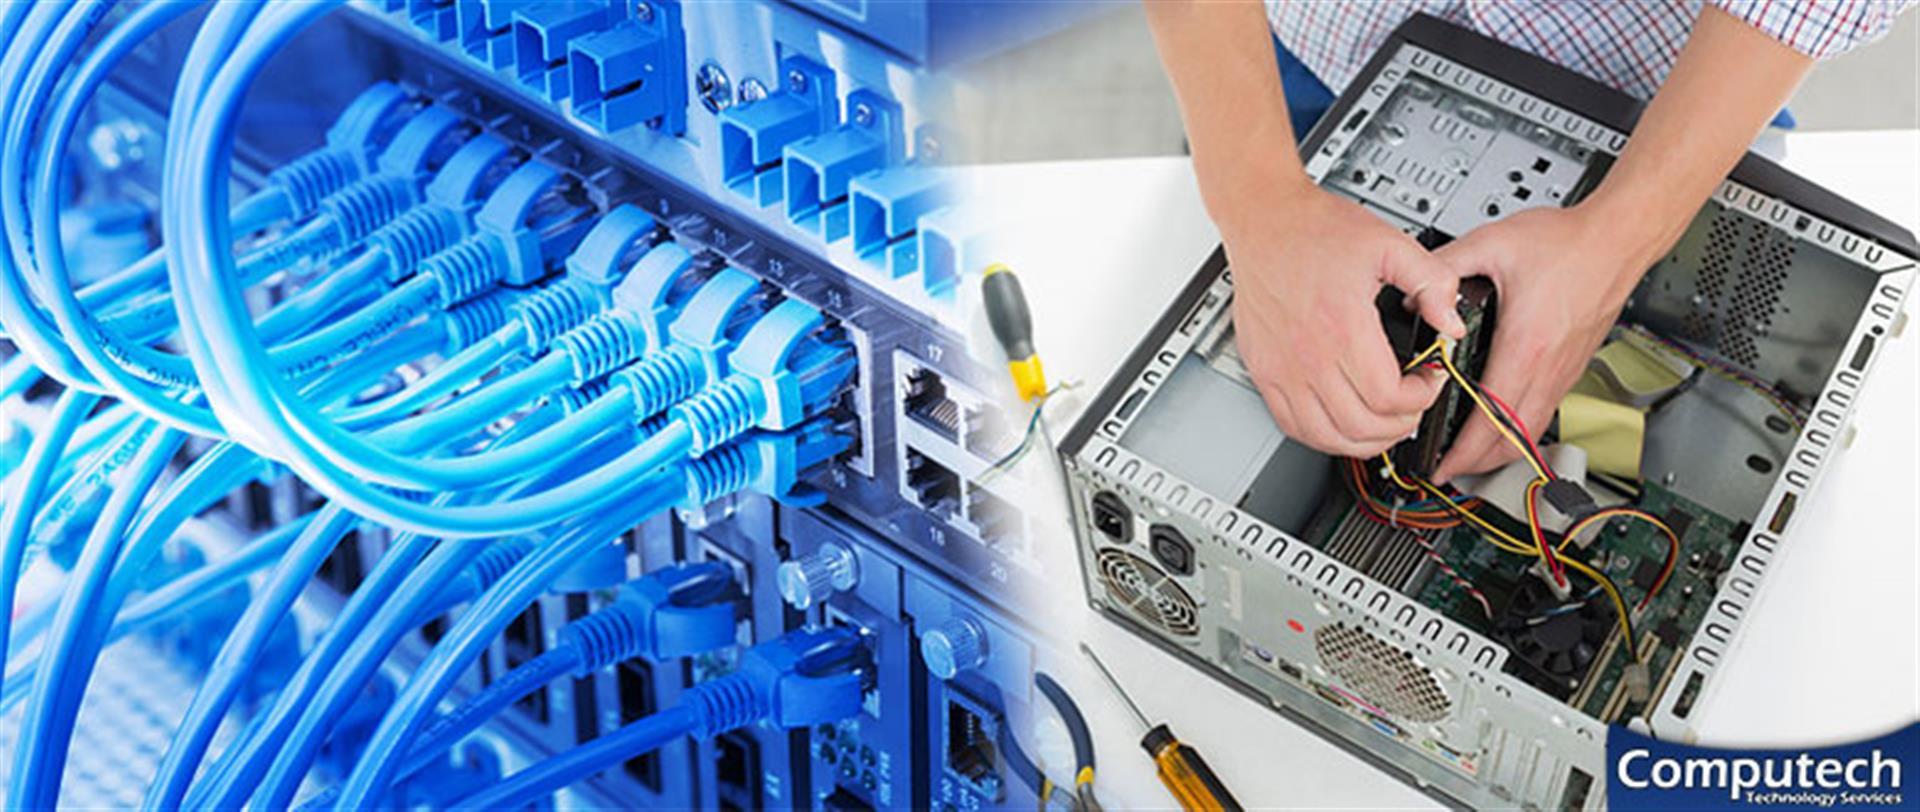 Christiansburg Virginia Onsite Computer PC & Printer Repair, Networking, Voice & Data Cabling Contractors